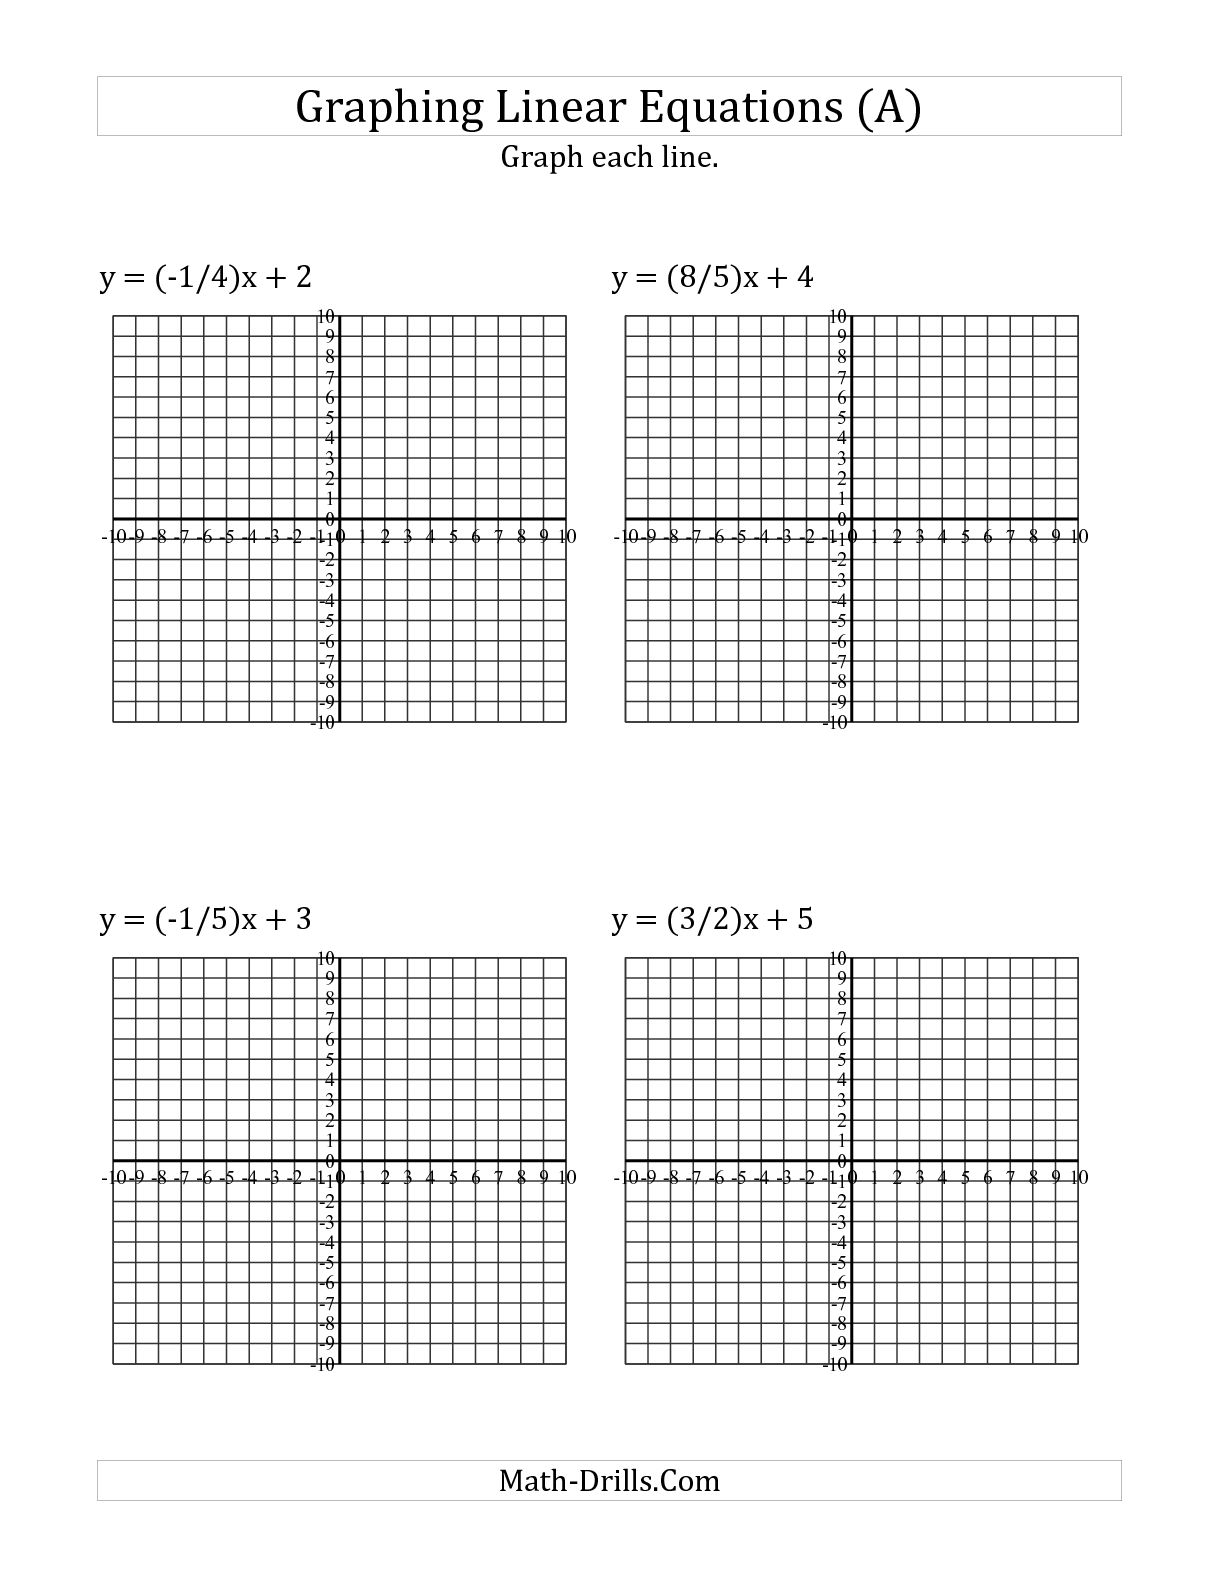 Y Mx B Word Problems Worksheet Answers